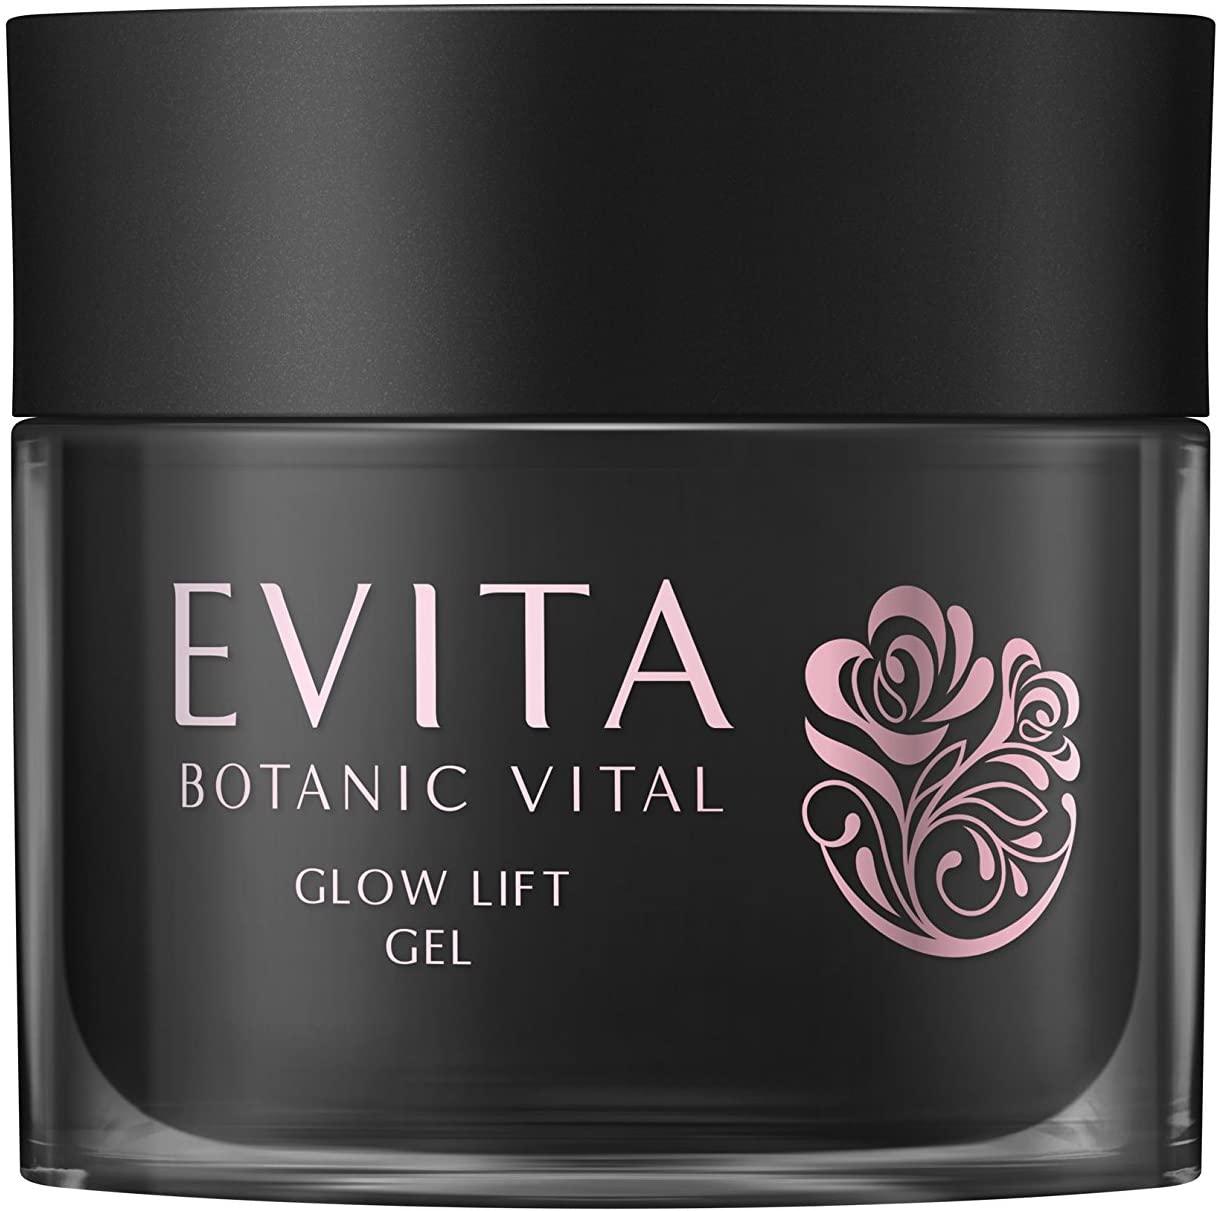 EVITA(エビータ) ボタニバイタル 艶リフト ジェルの商品画像